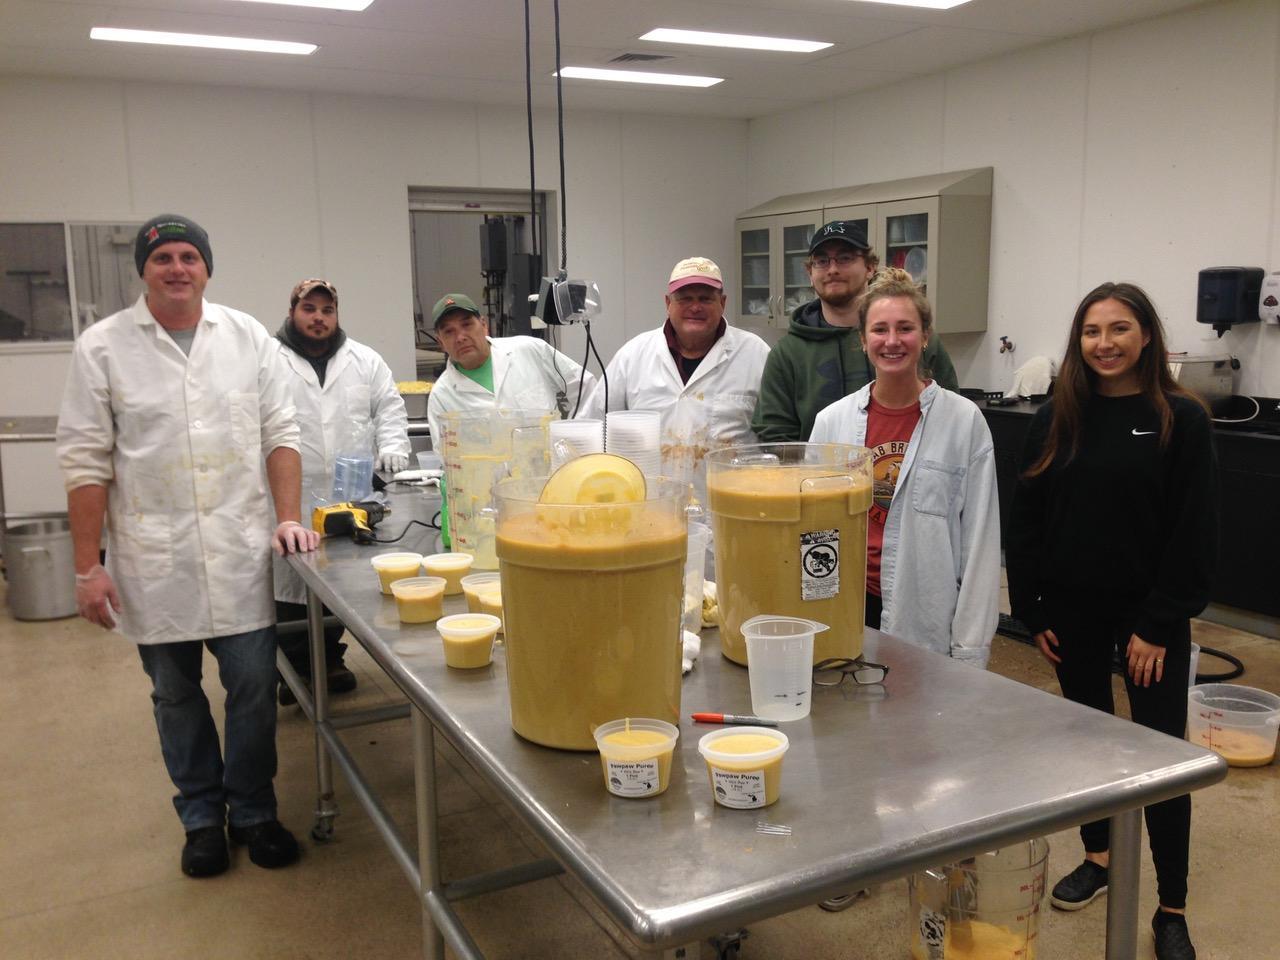 The team surveys their work; pureed Pawpaw fruit.